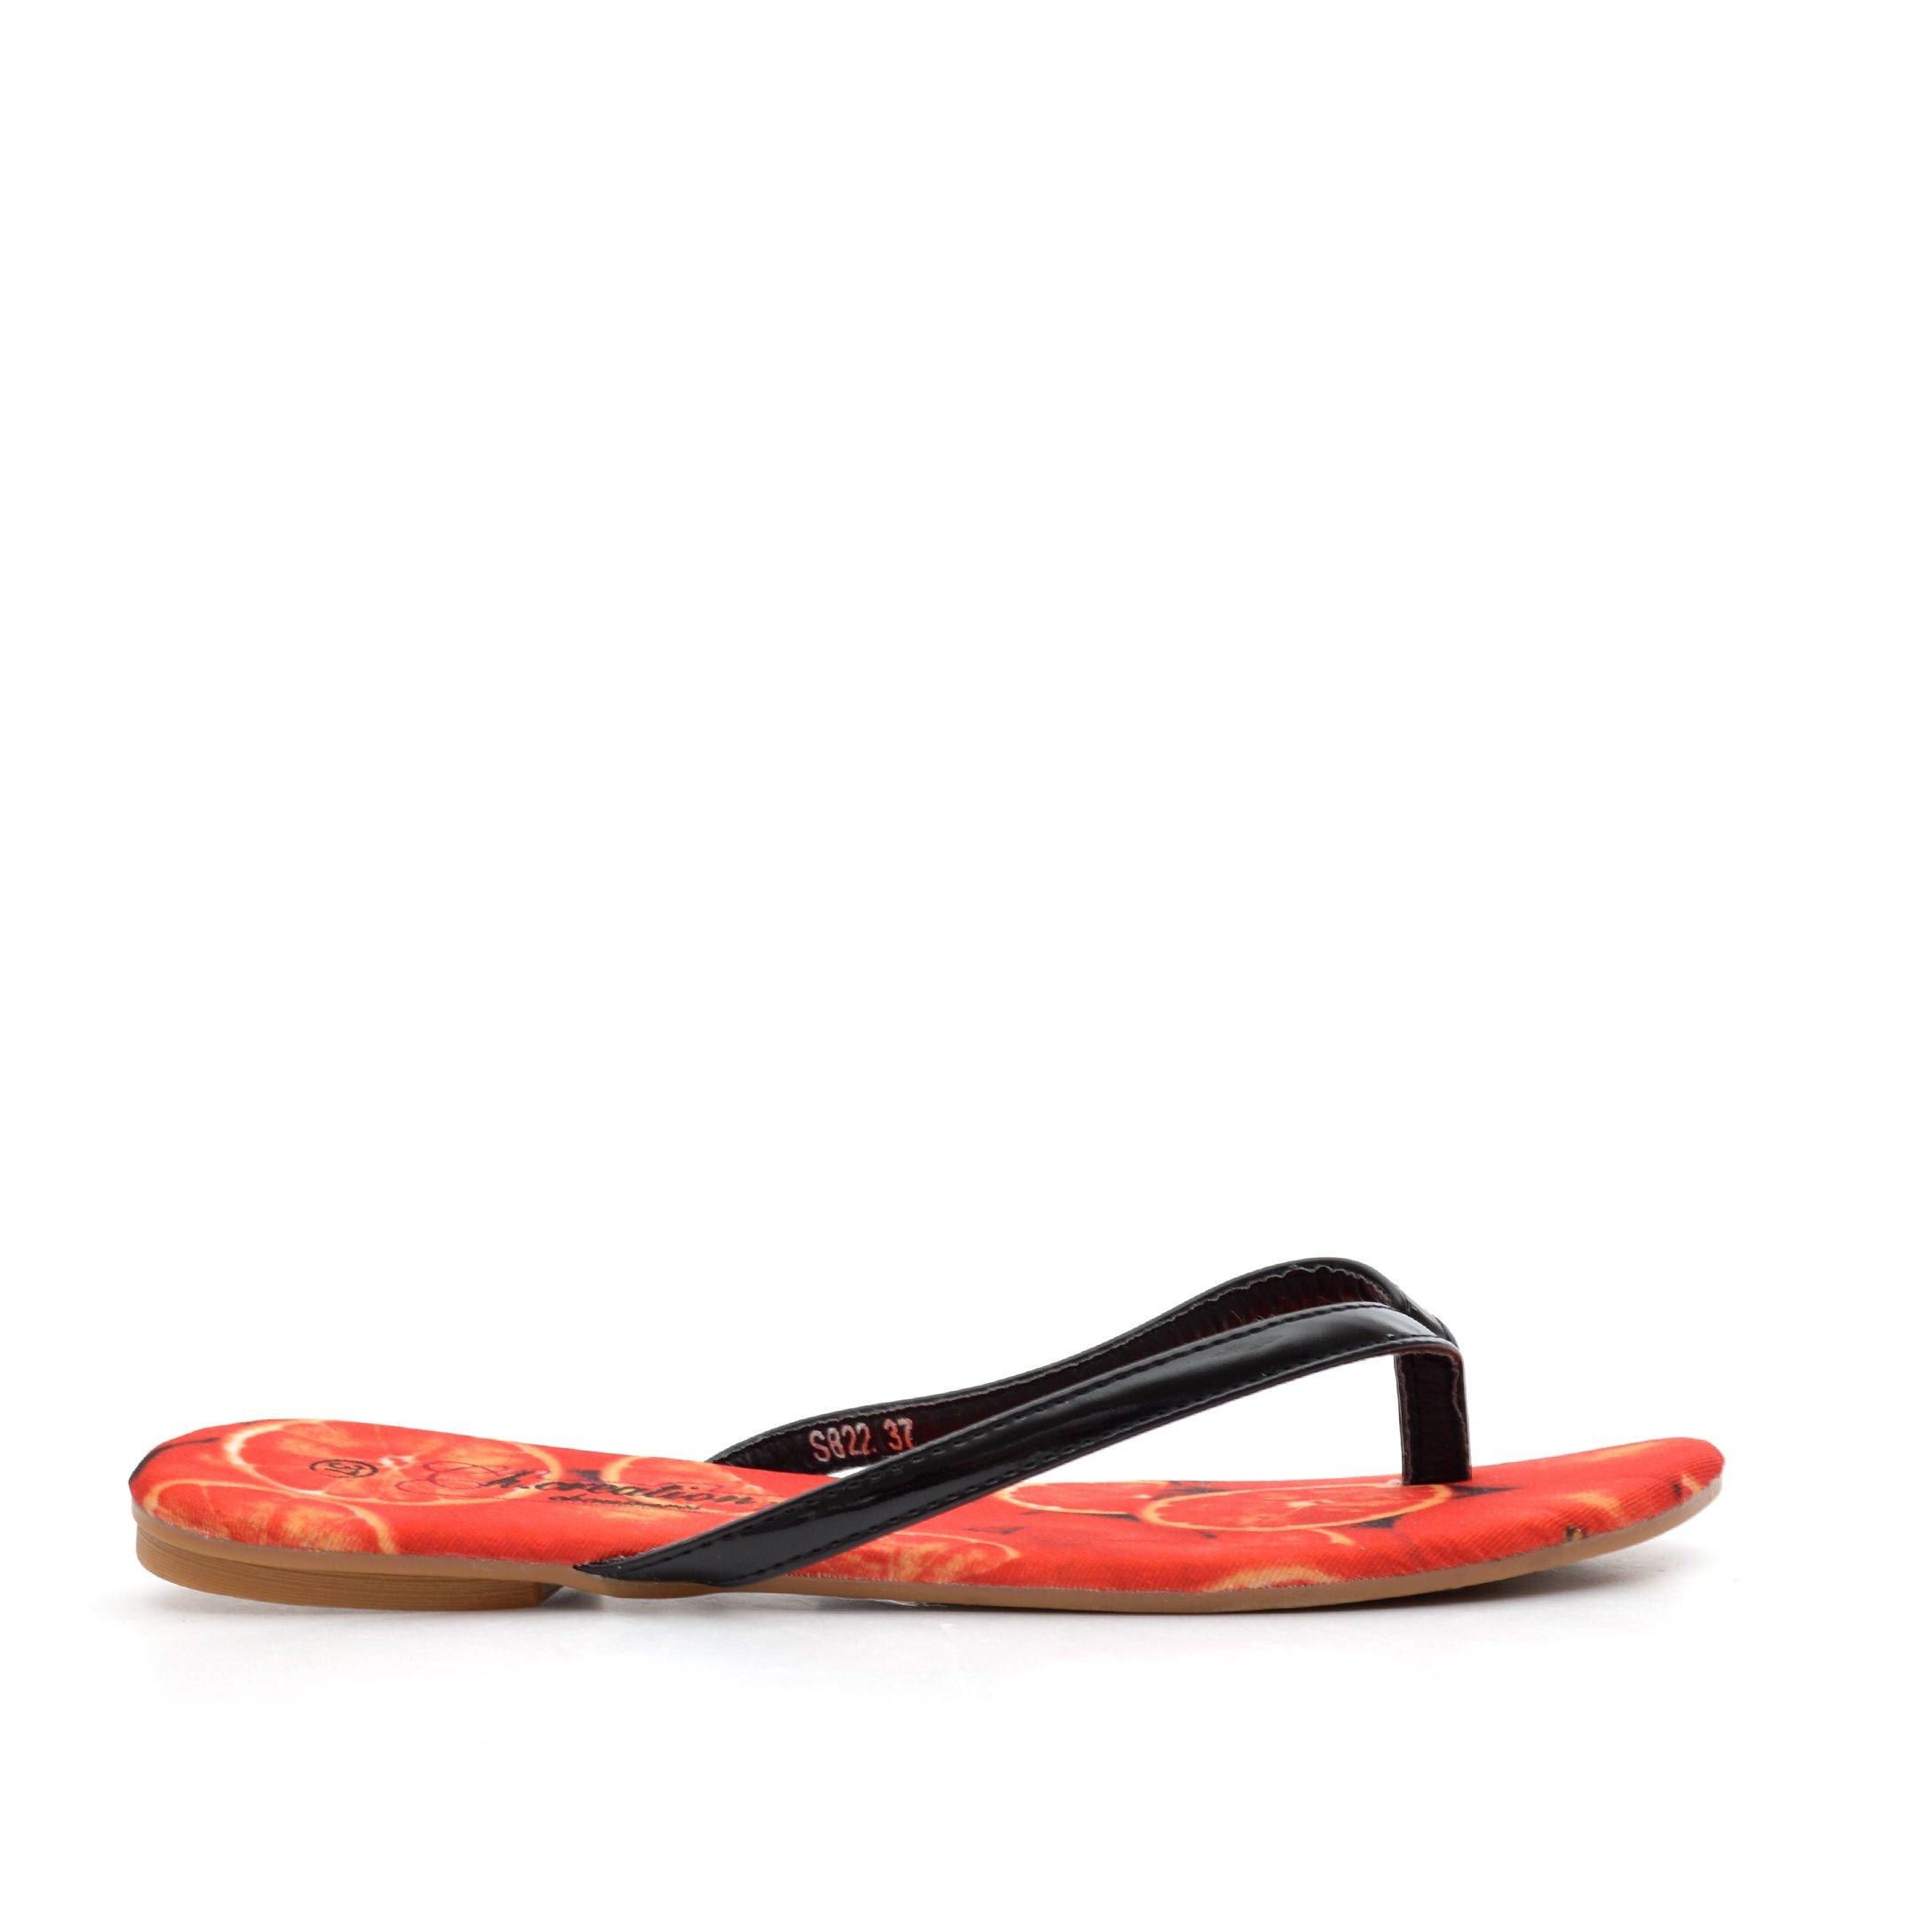 Papuci Dama S822 Negri